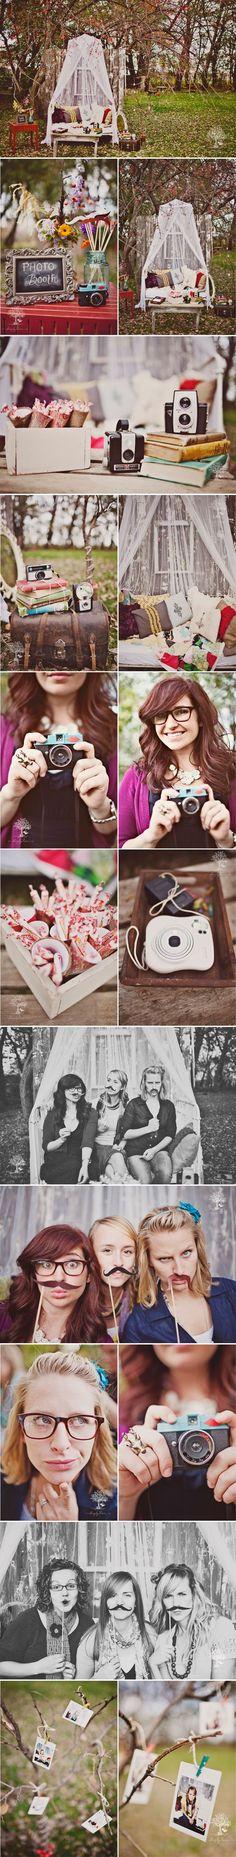 Photobooth romantique // http://www.deco.fr/loisirs-creatifs/photos-78715/